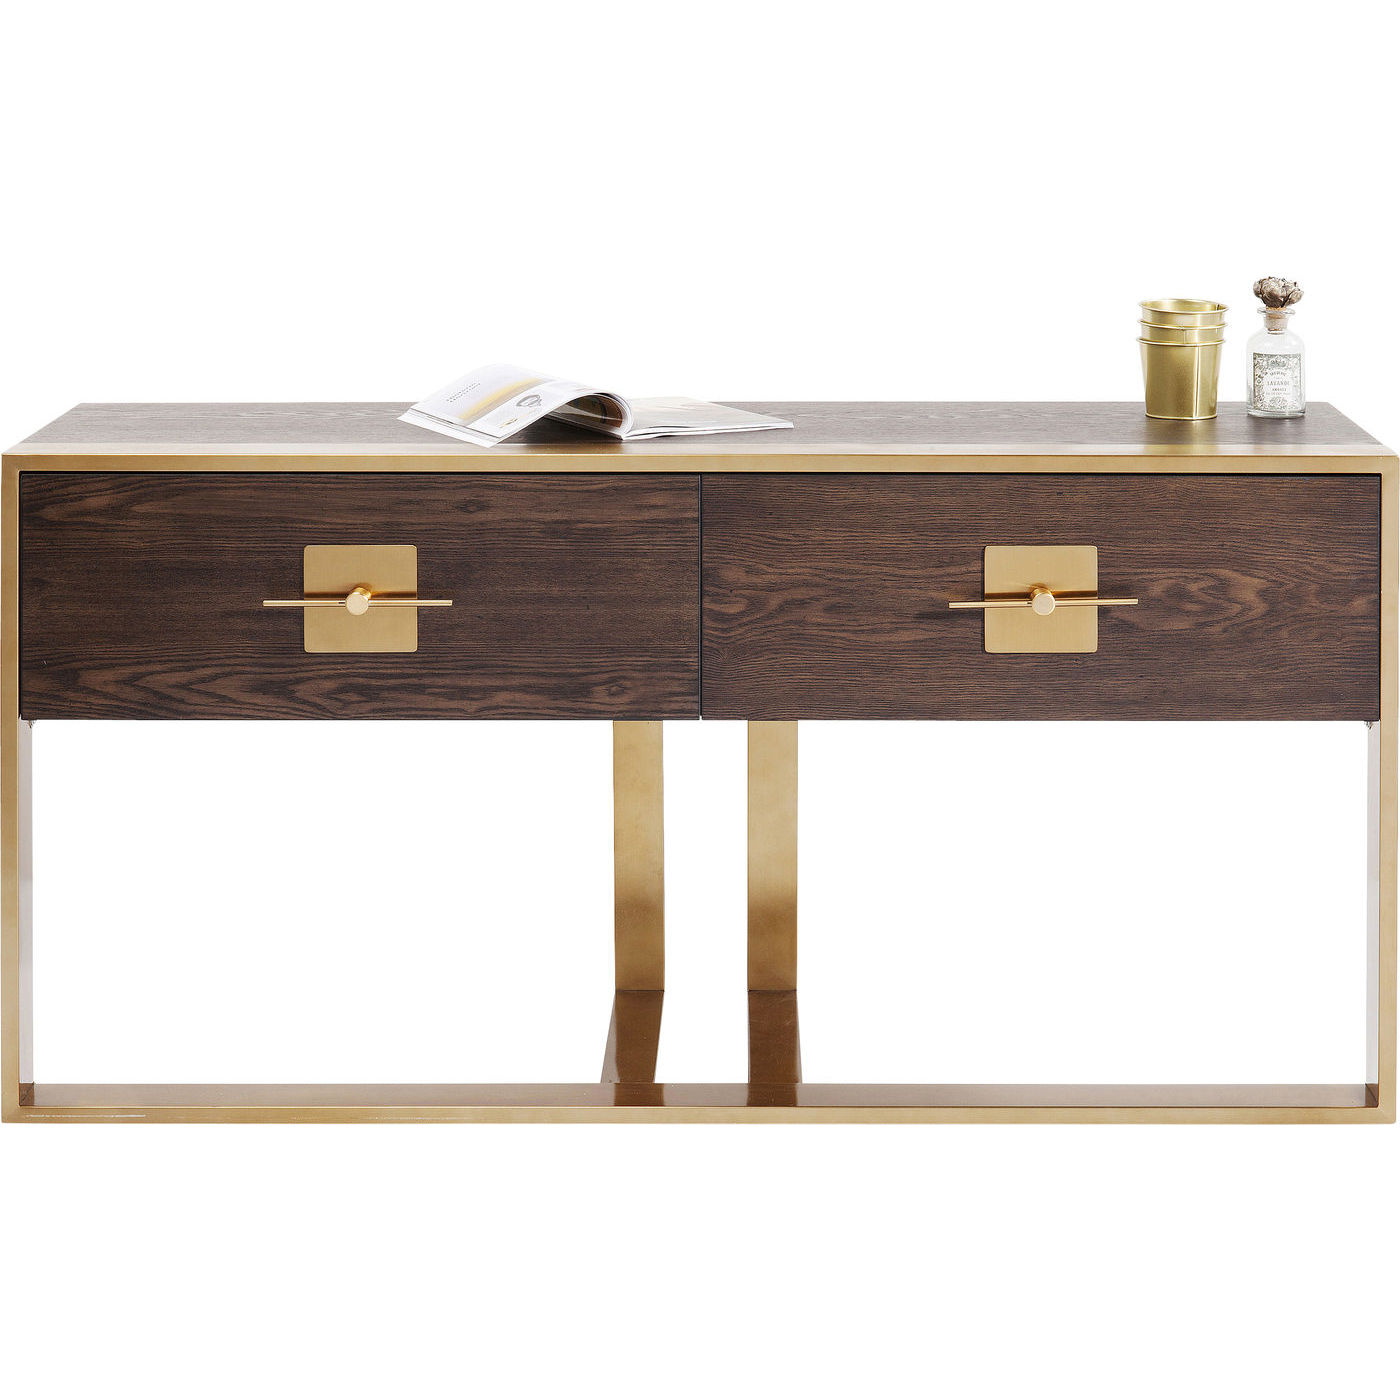 KARE DESIGN Osaka konsolbord - brunt asketræsfinér/messing stål, m. 2 skuffer